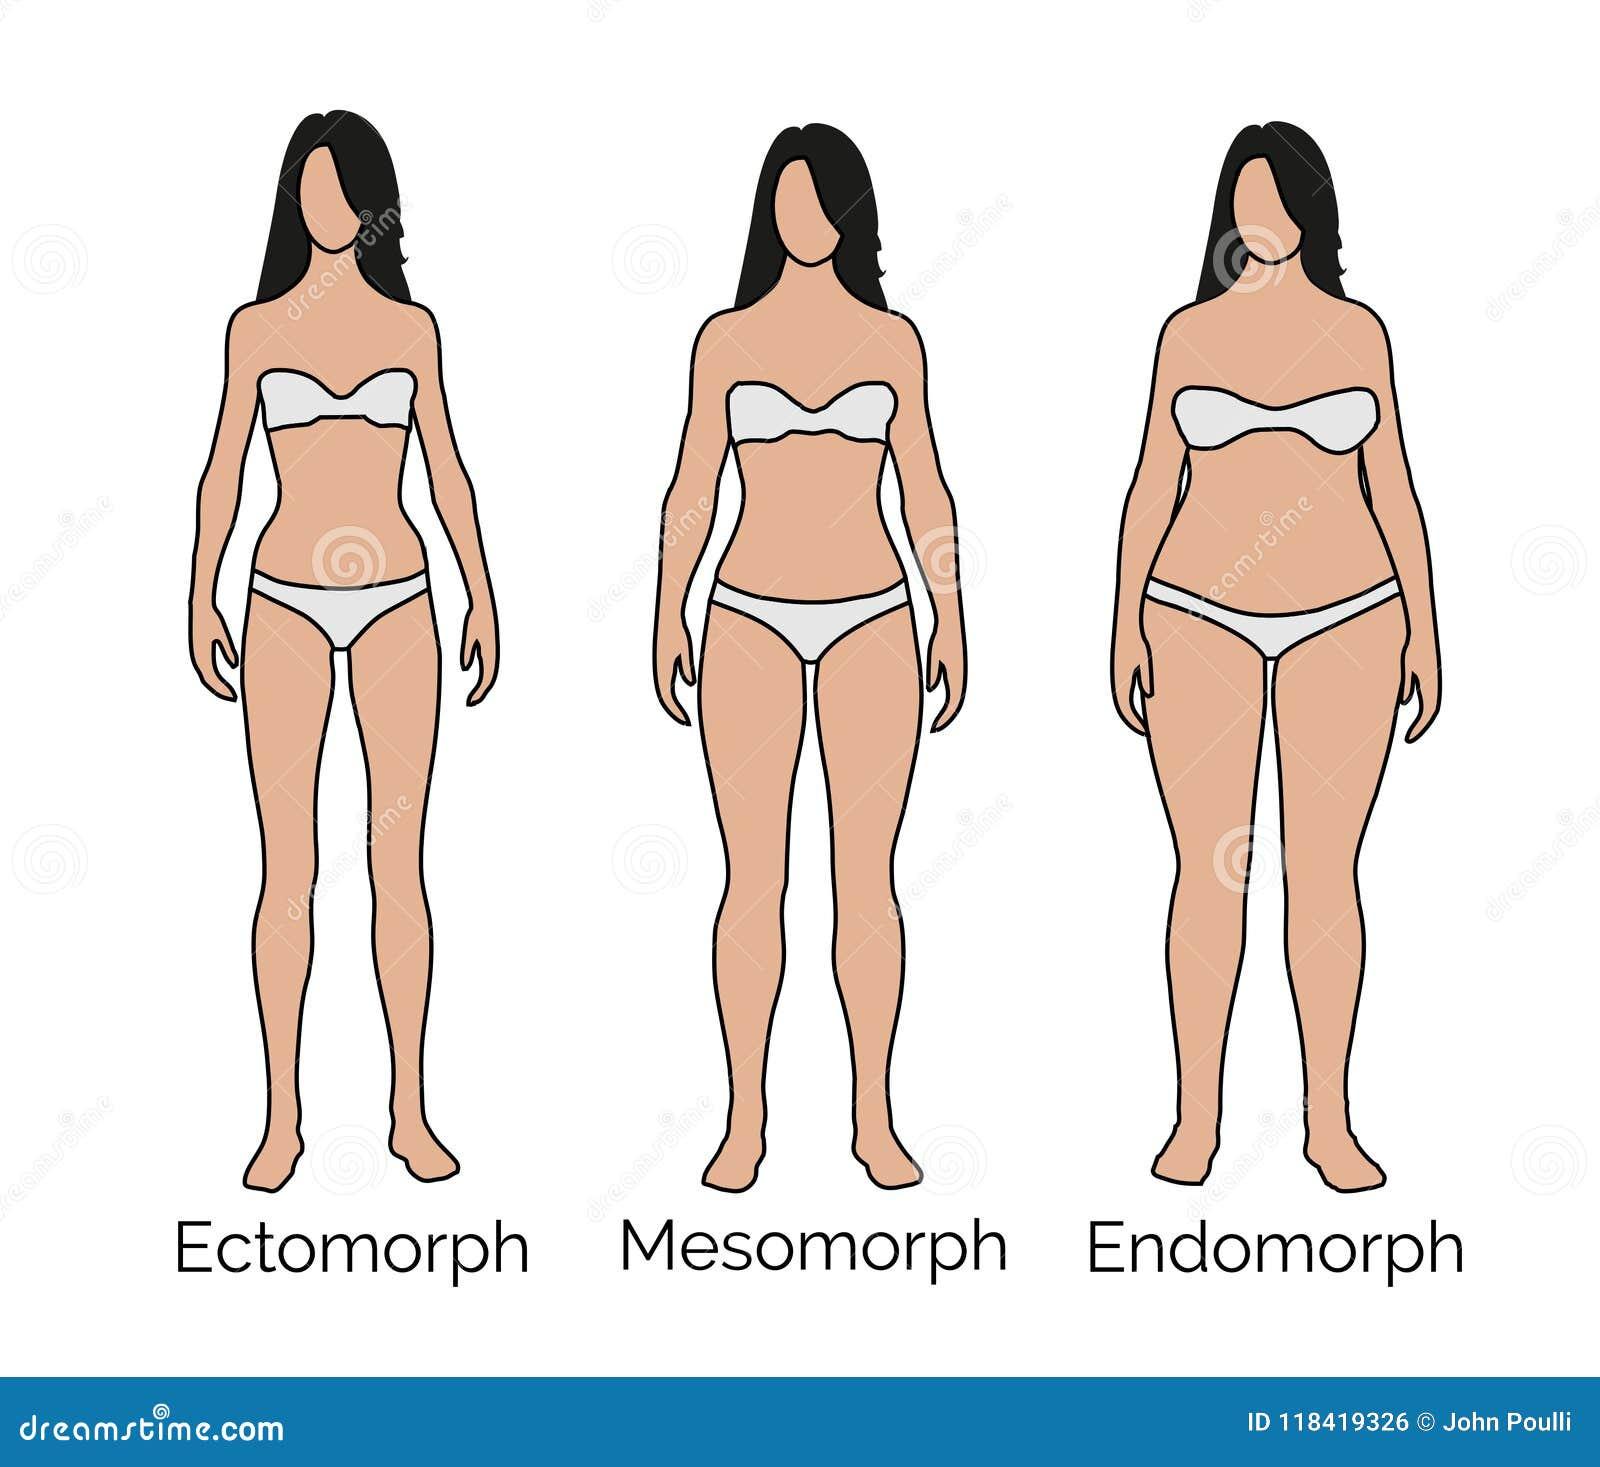 Ectomorph, Mesomorph, Endomorph Female - Small, Medium, Large Body ...